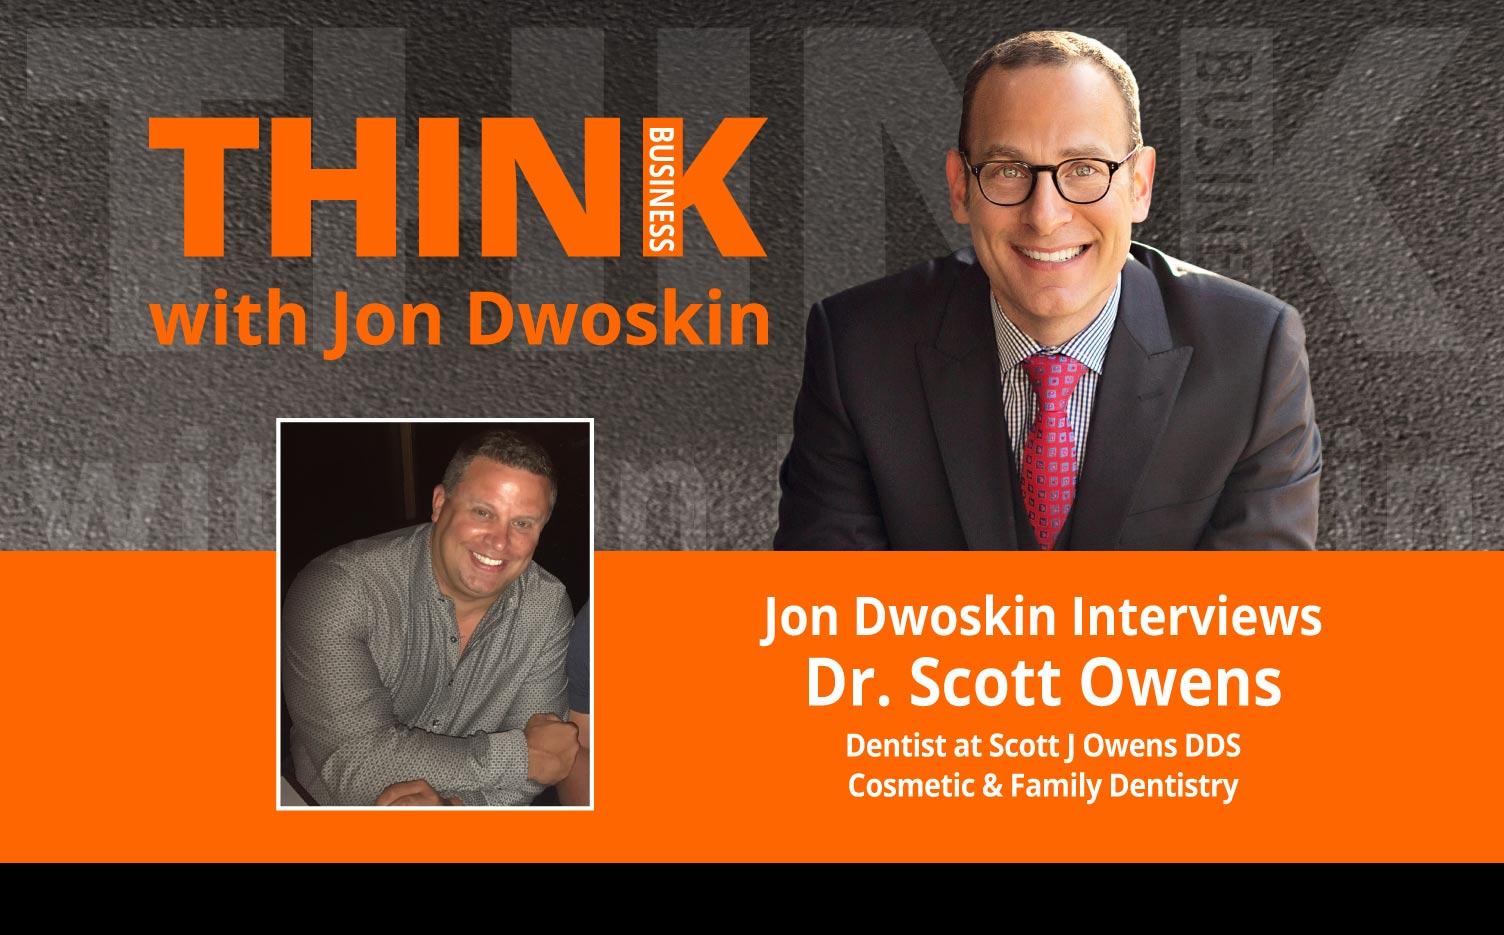 Jon Dwoskin Interviews Dr. Scott Owens, Dentist, Scott J Owens DDS Cosmetic & Family Dentistry